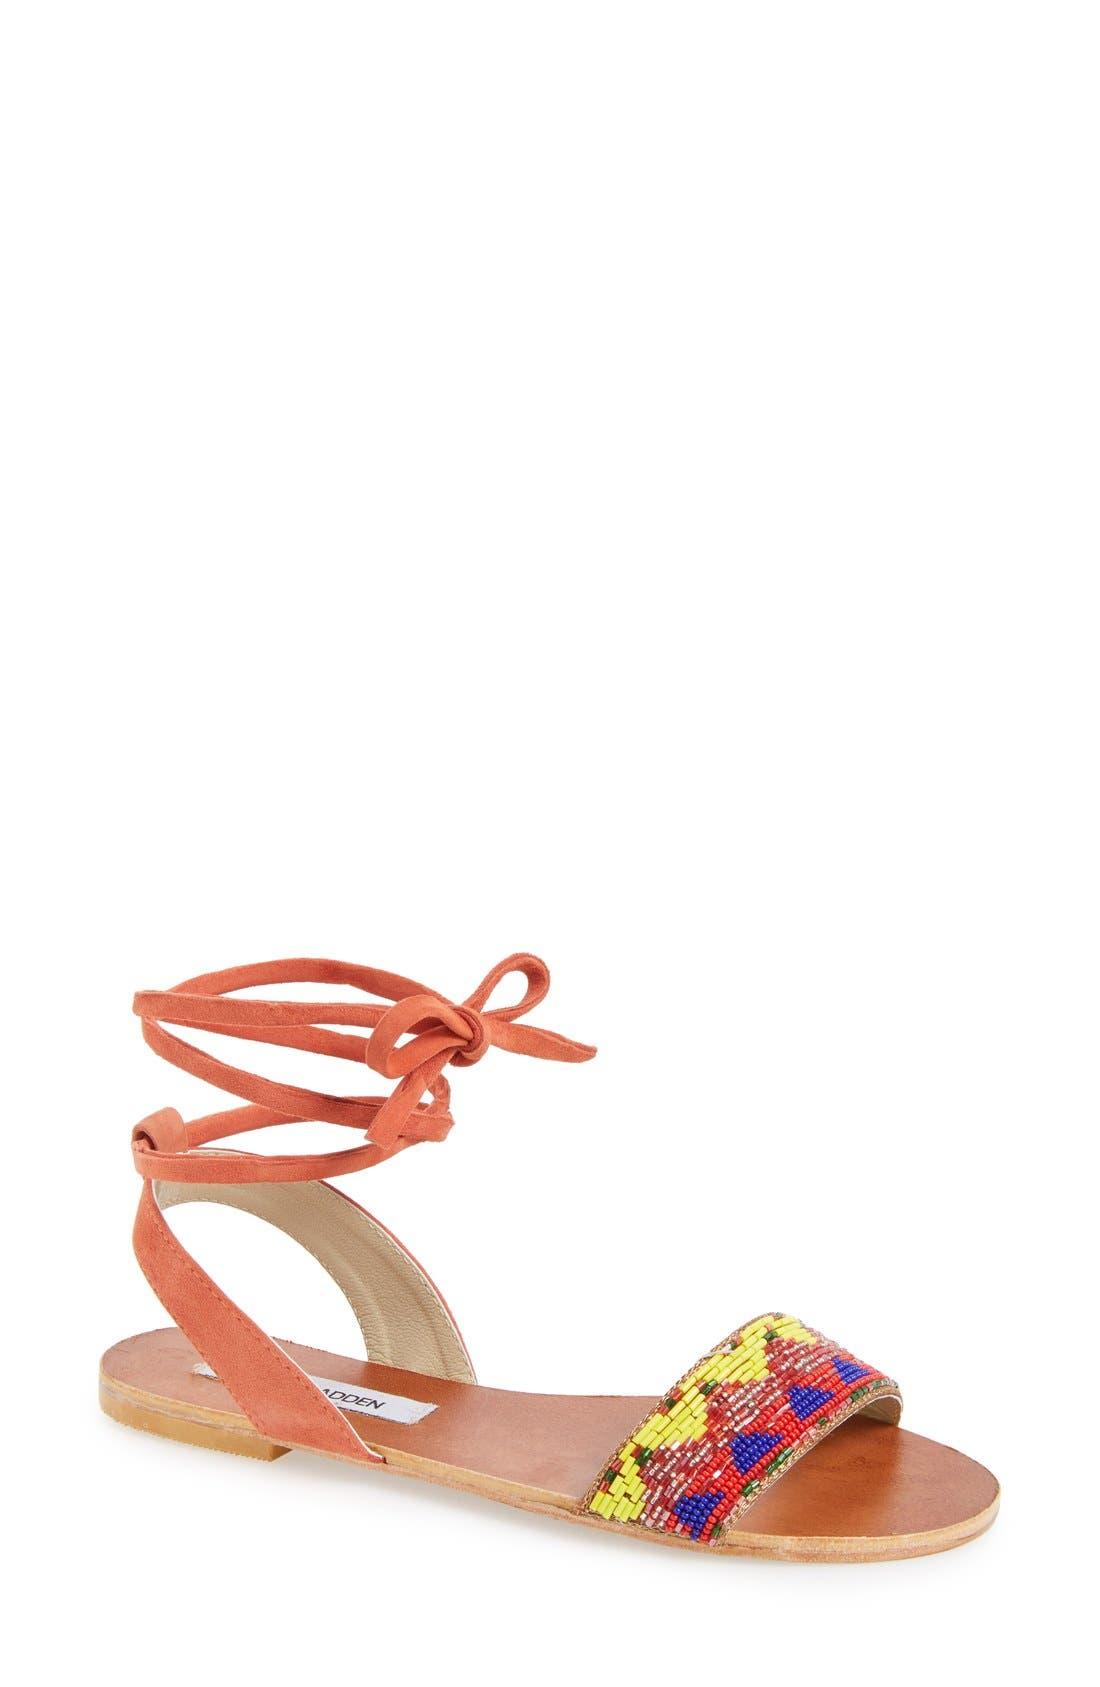 'Shaney' Beaded Wraparound Lace Sandal,                             Main thumbnail 1, color,                             Bright Multi